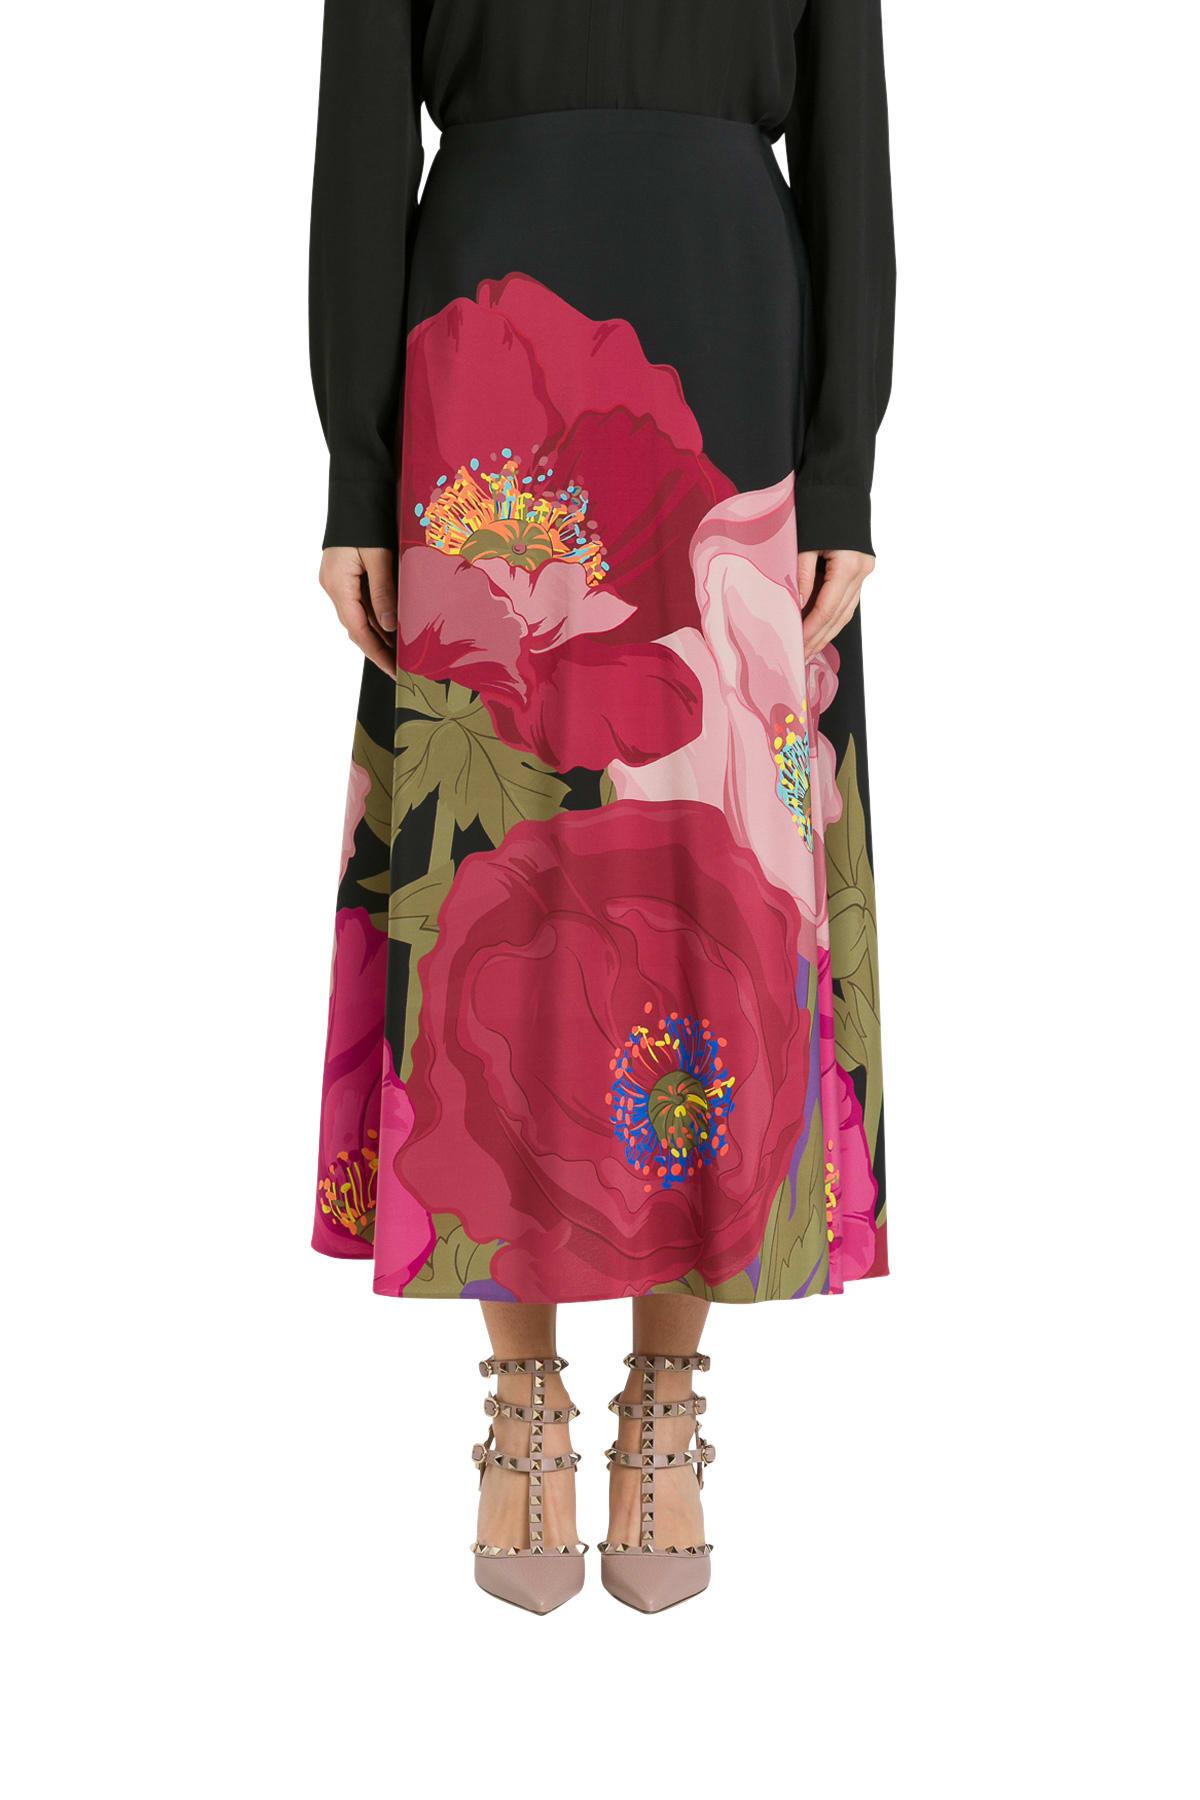 Valentino Printed Crepe De Chine Skirt With Macro Poppy Print